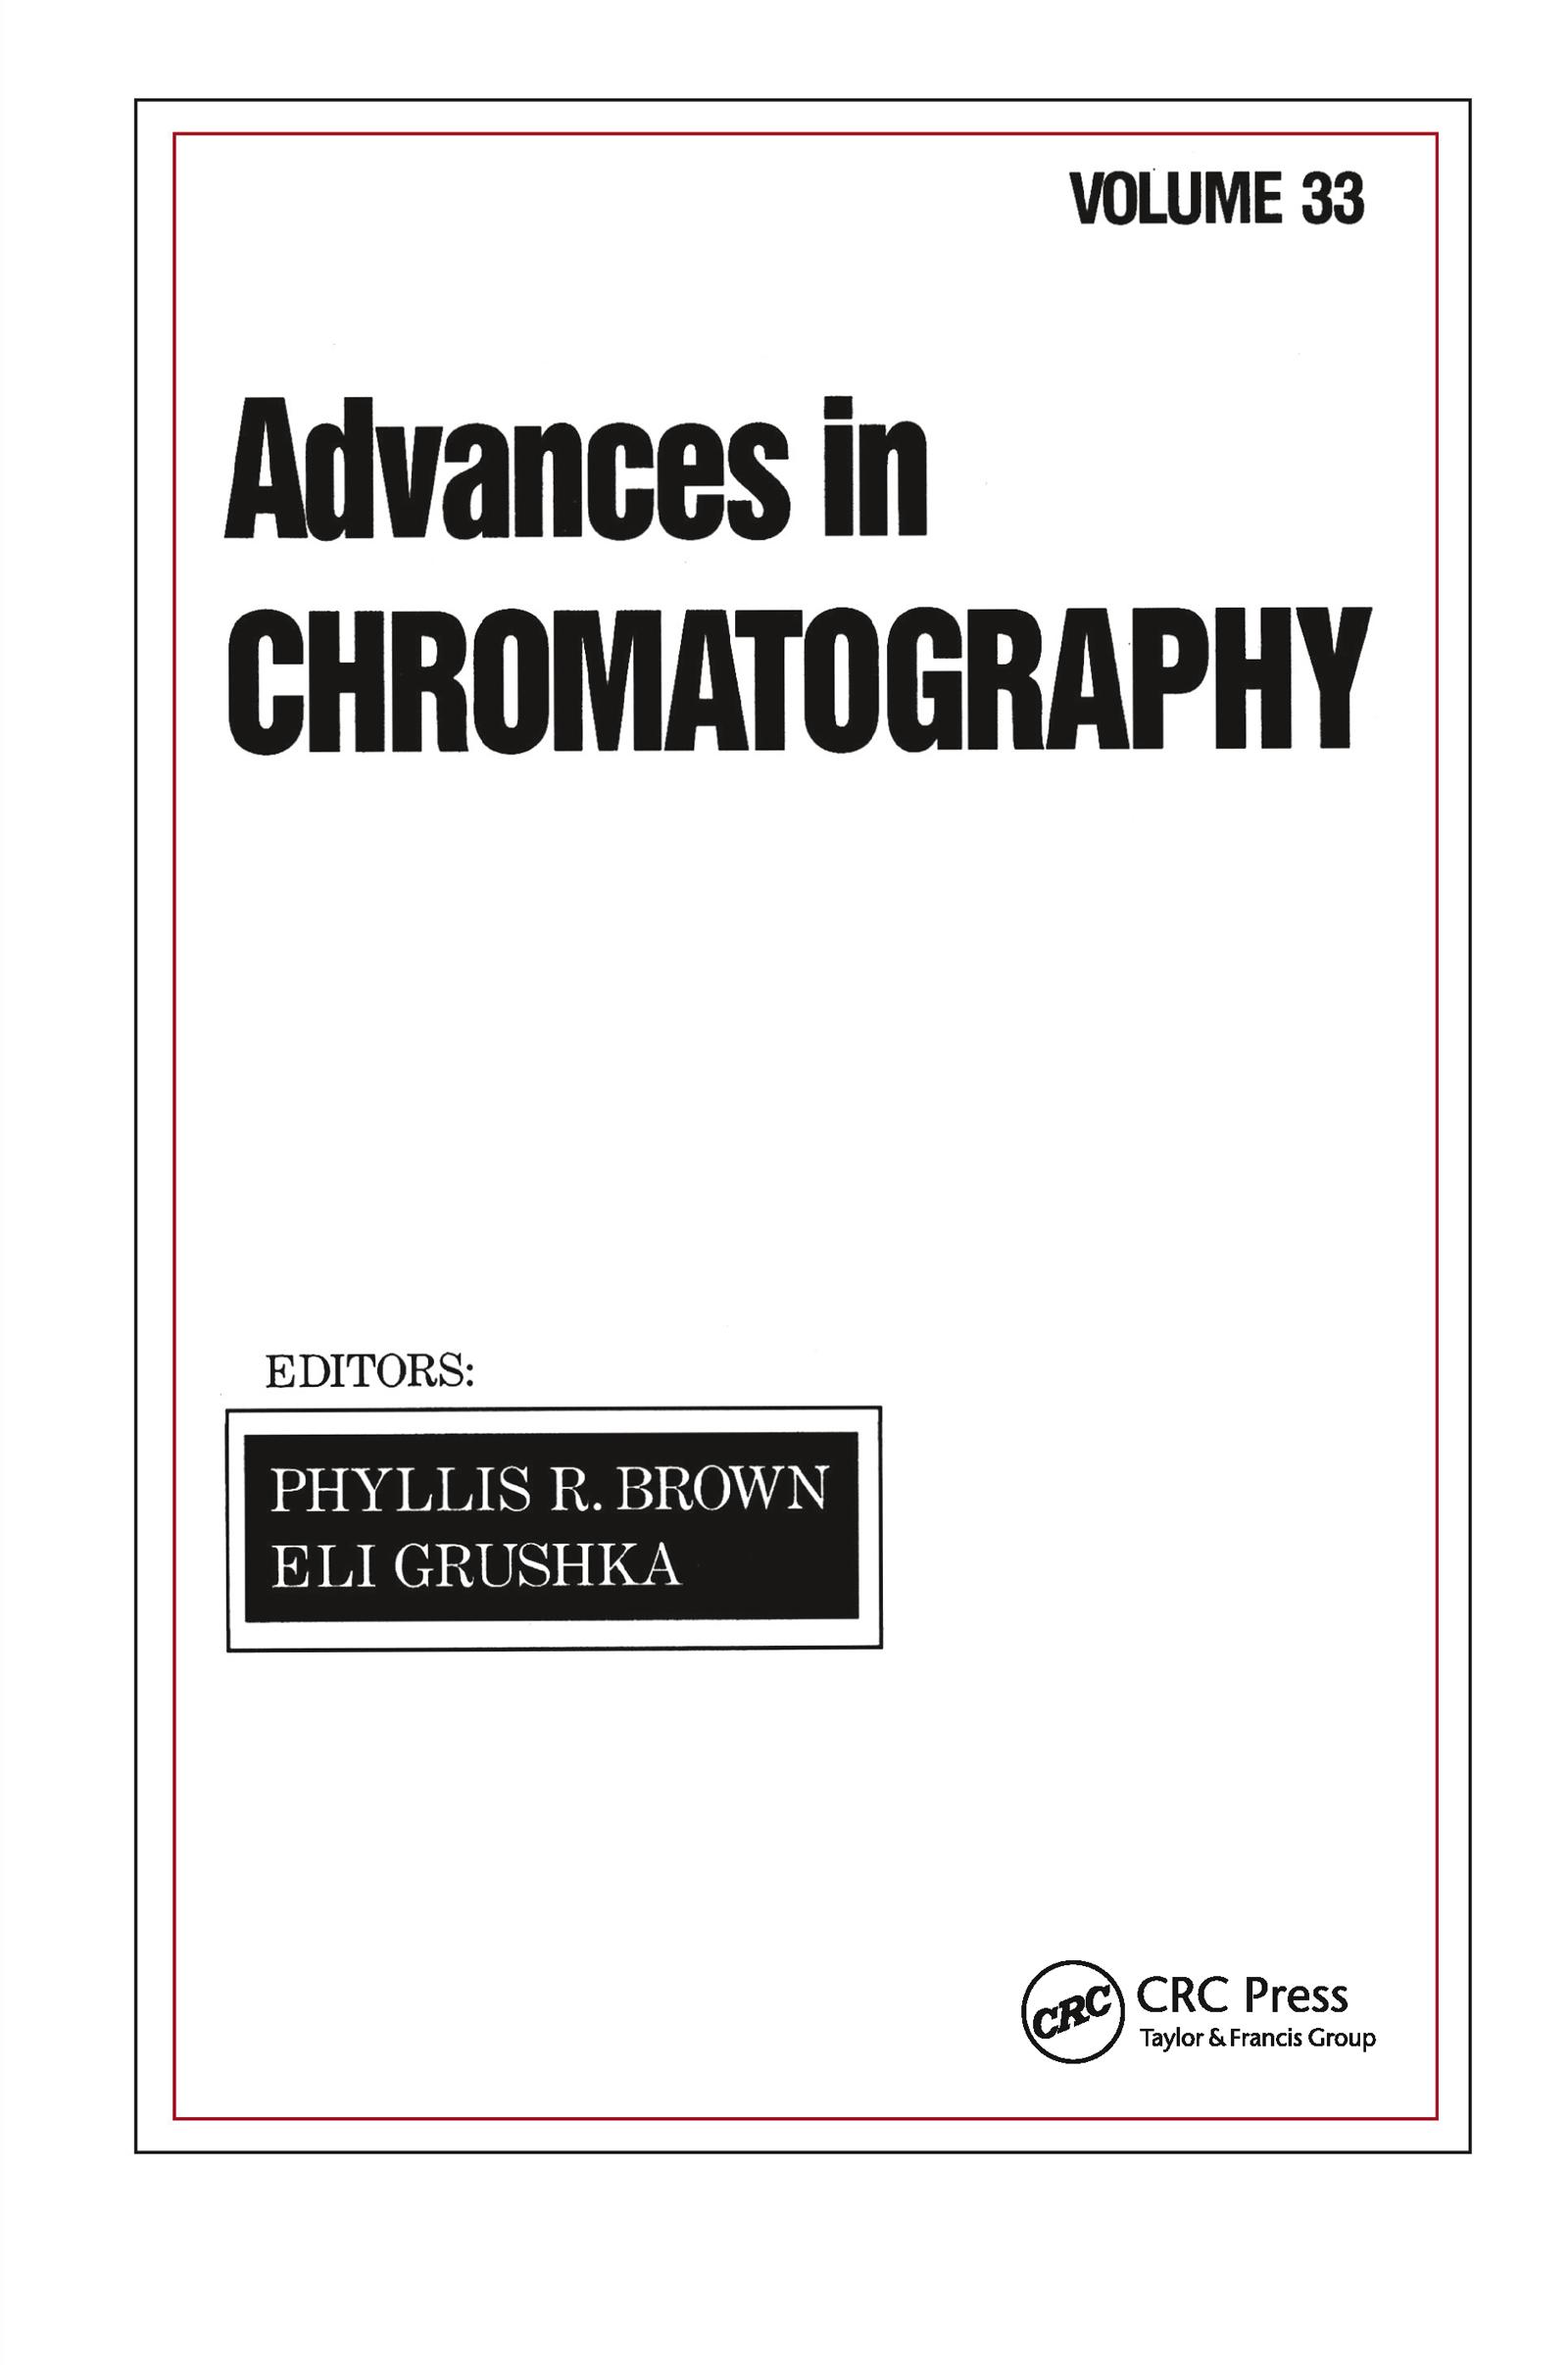 Advances in Chromatography: Volume 33 book cover